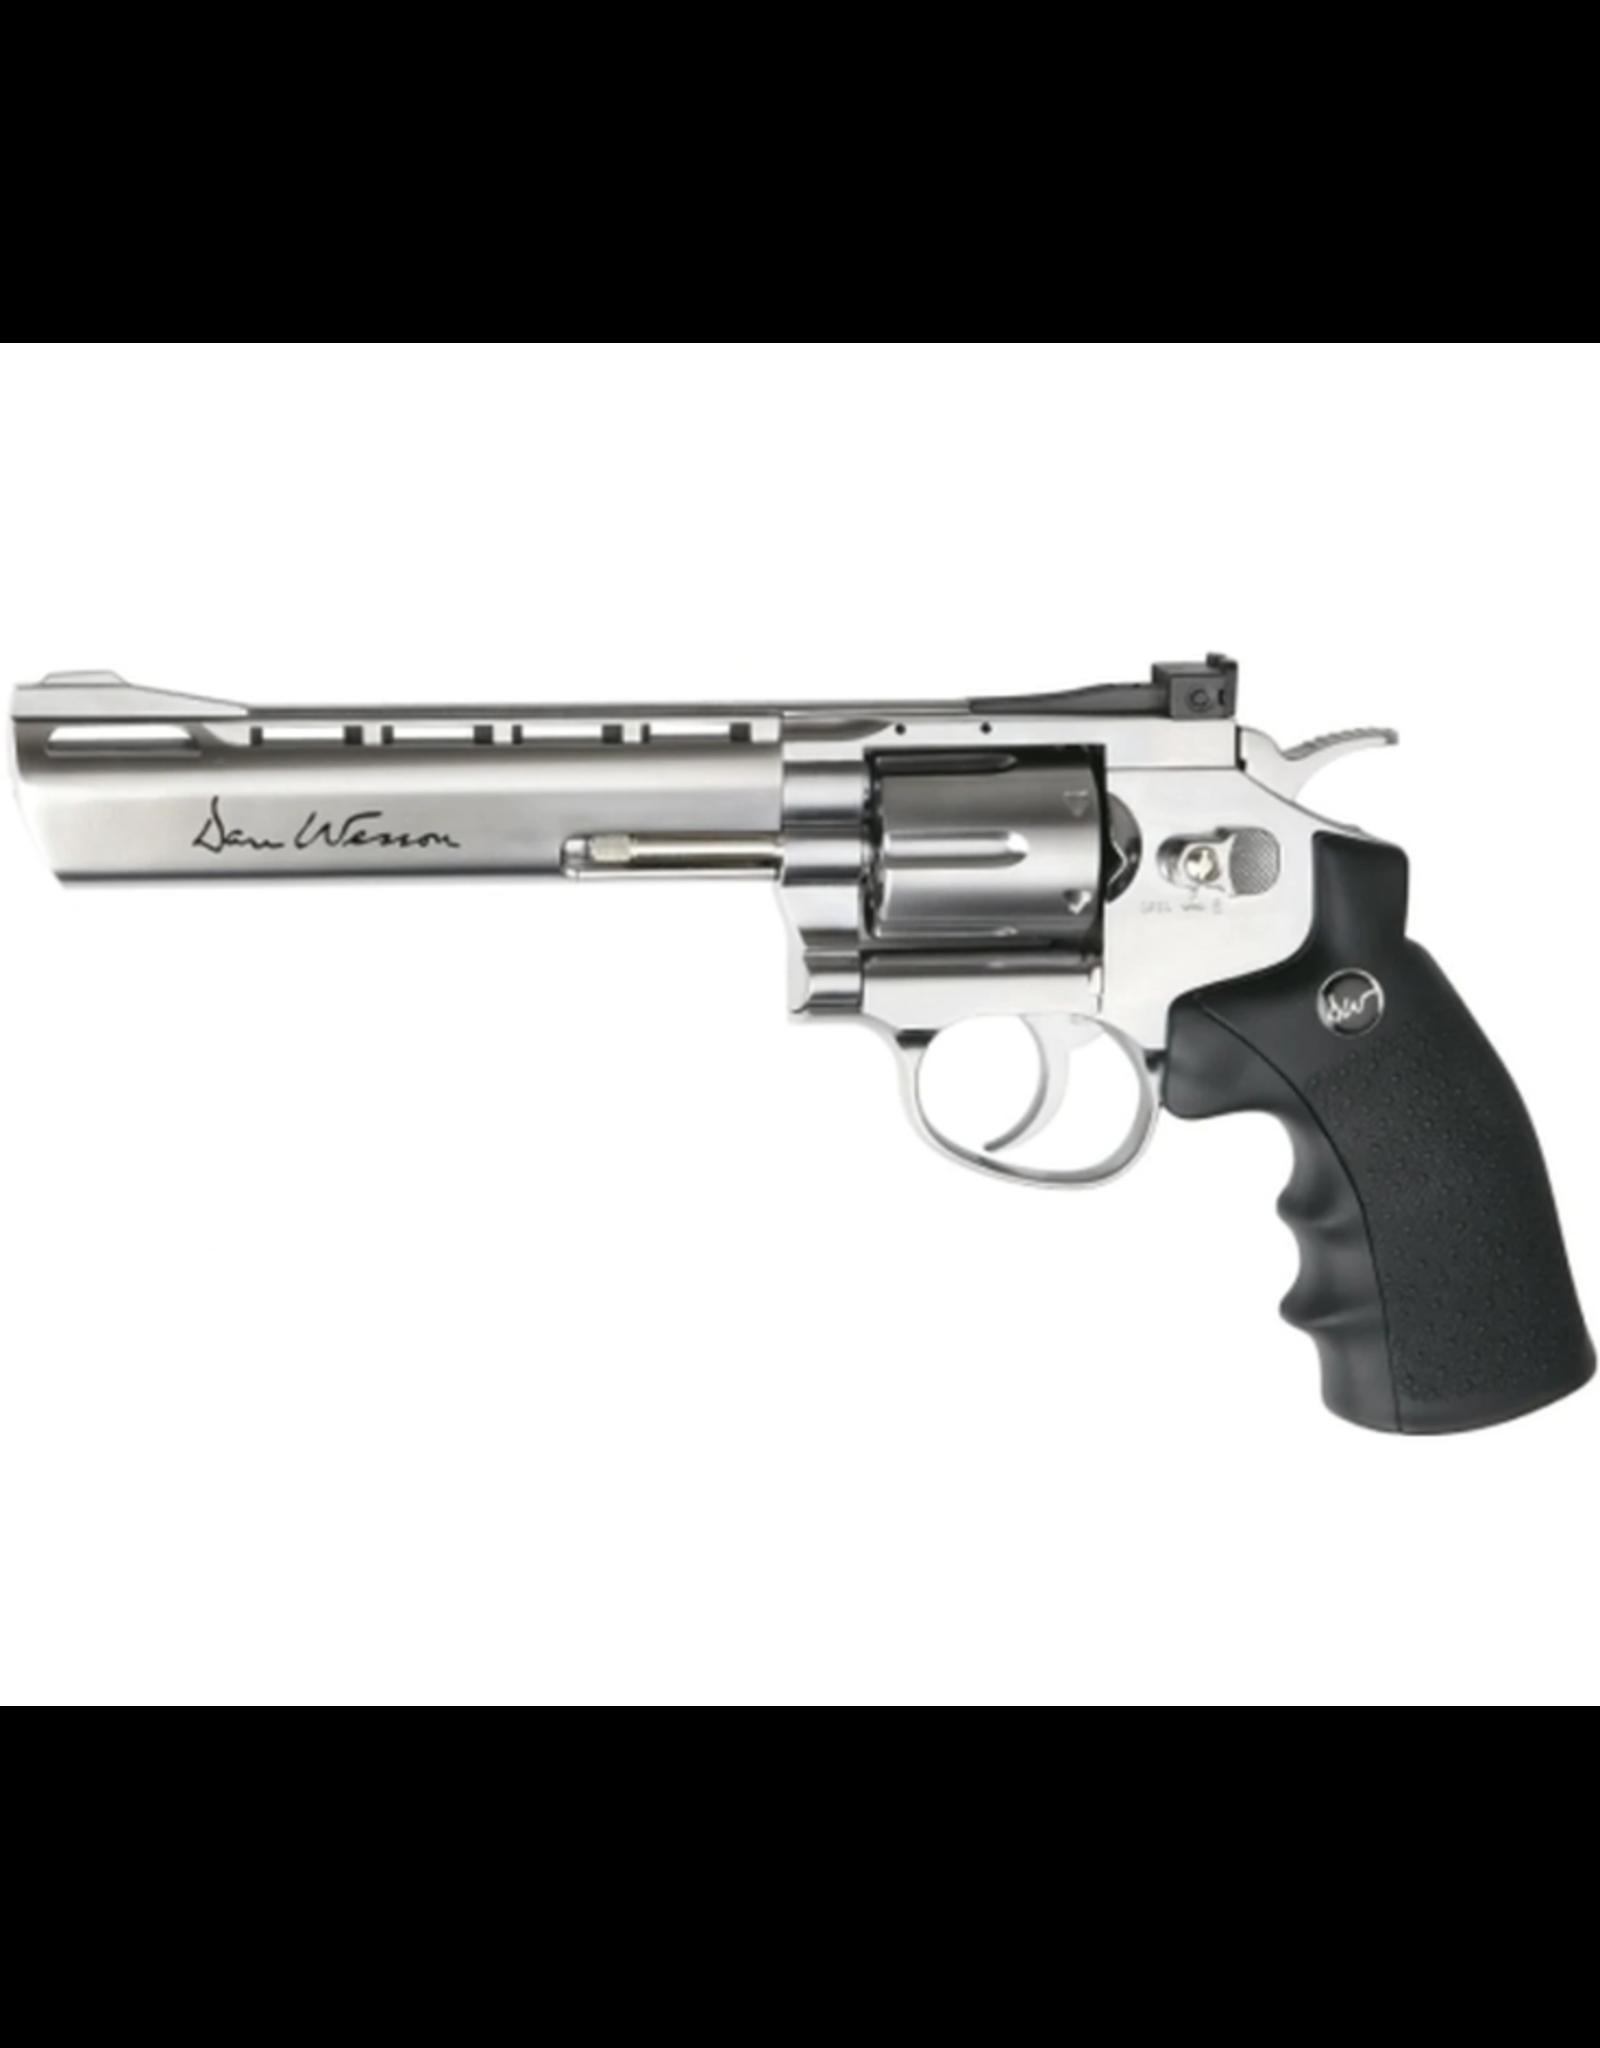 "ASG ASG Airgun GNB Co2 4.5mm Dan Wesson 6"" Silver Revolver"